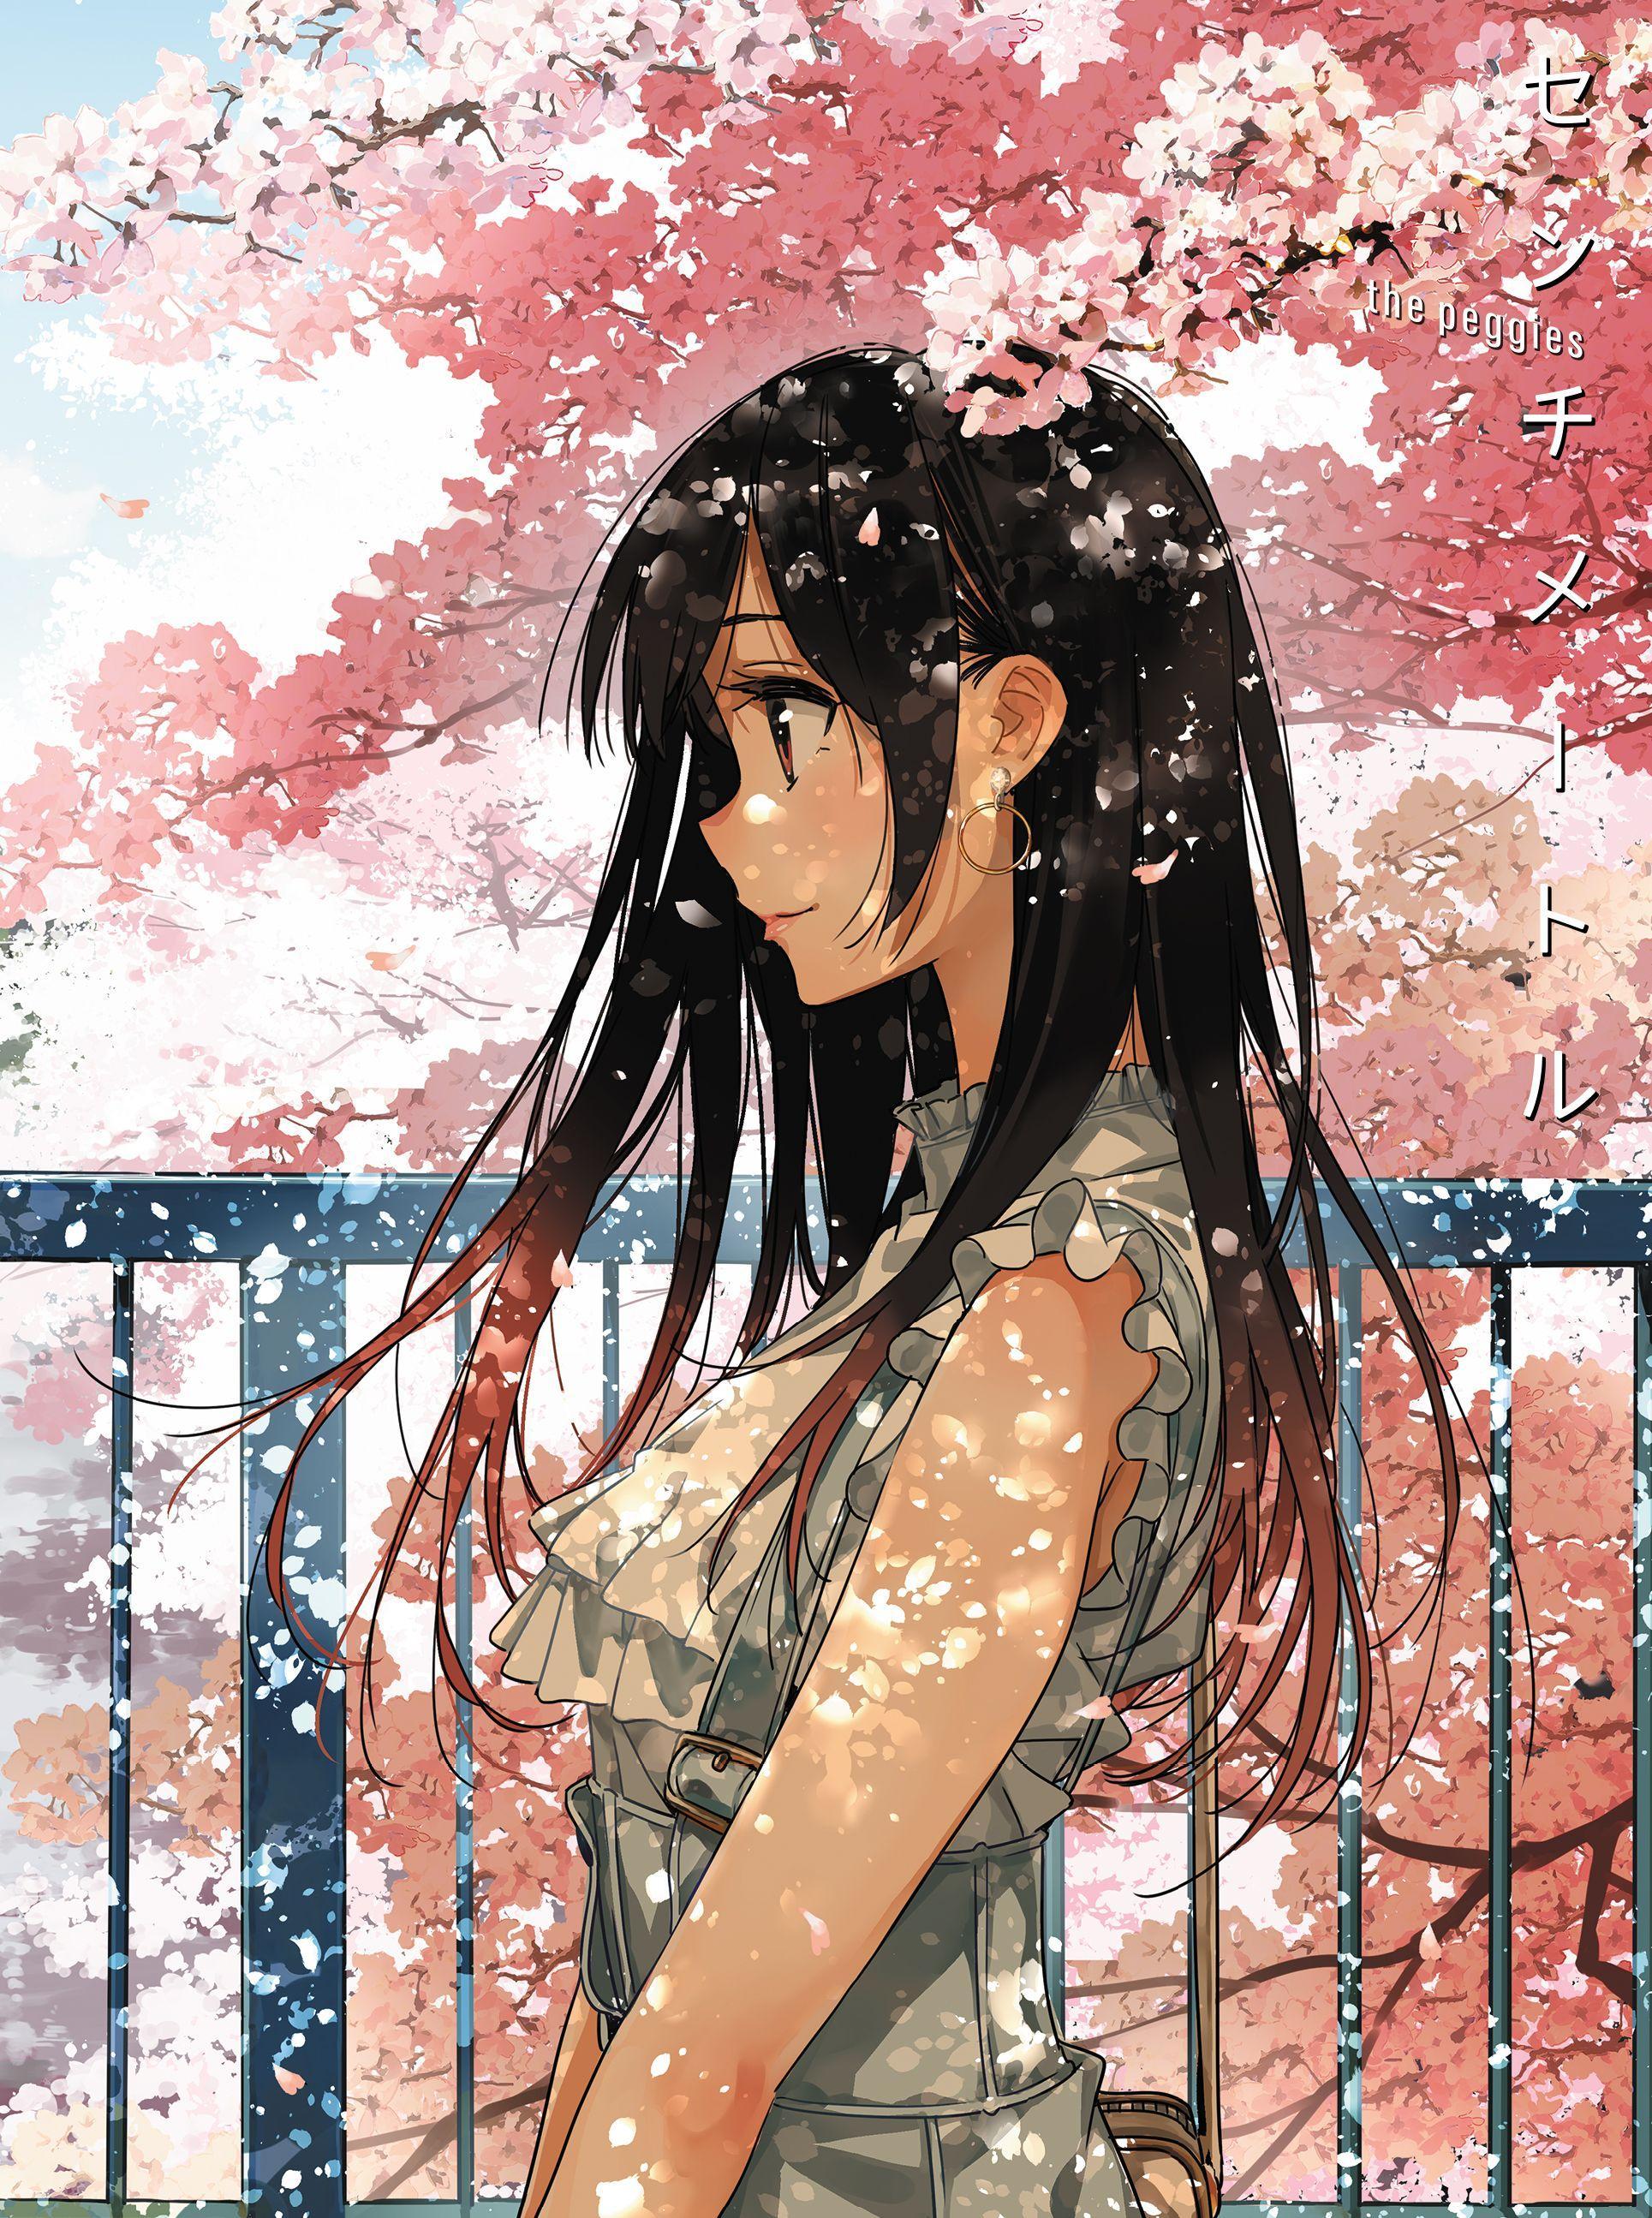 Chizuru Mizuhara Wallpapers Top Free Chizuru Mizuhara Backgrounds Wallpaperaccess